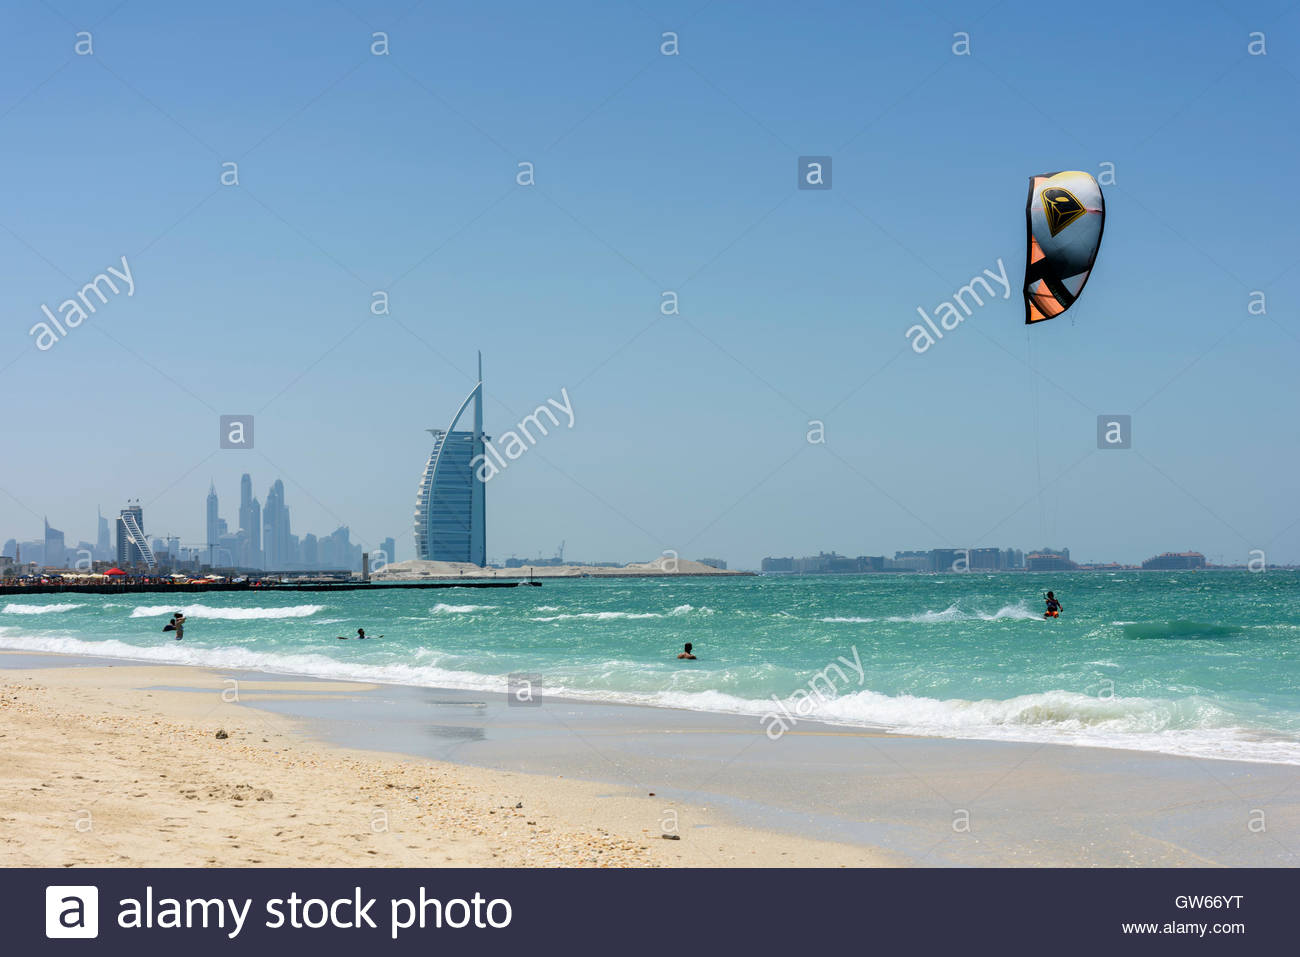 Kite Surf in Dubai with the famous Burj Al Arab hotel in background. No model/property releases. Dubai Emirates, - Stock Image